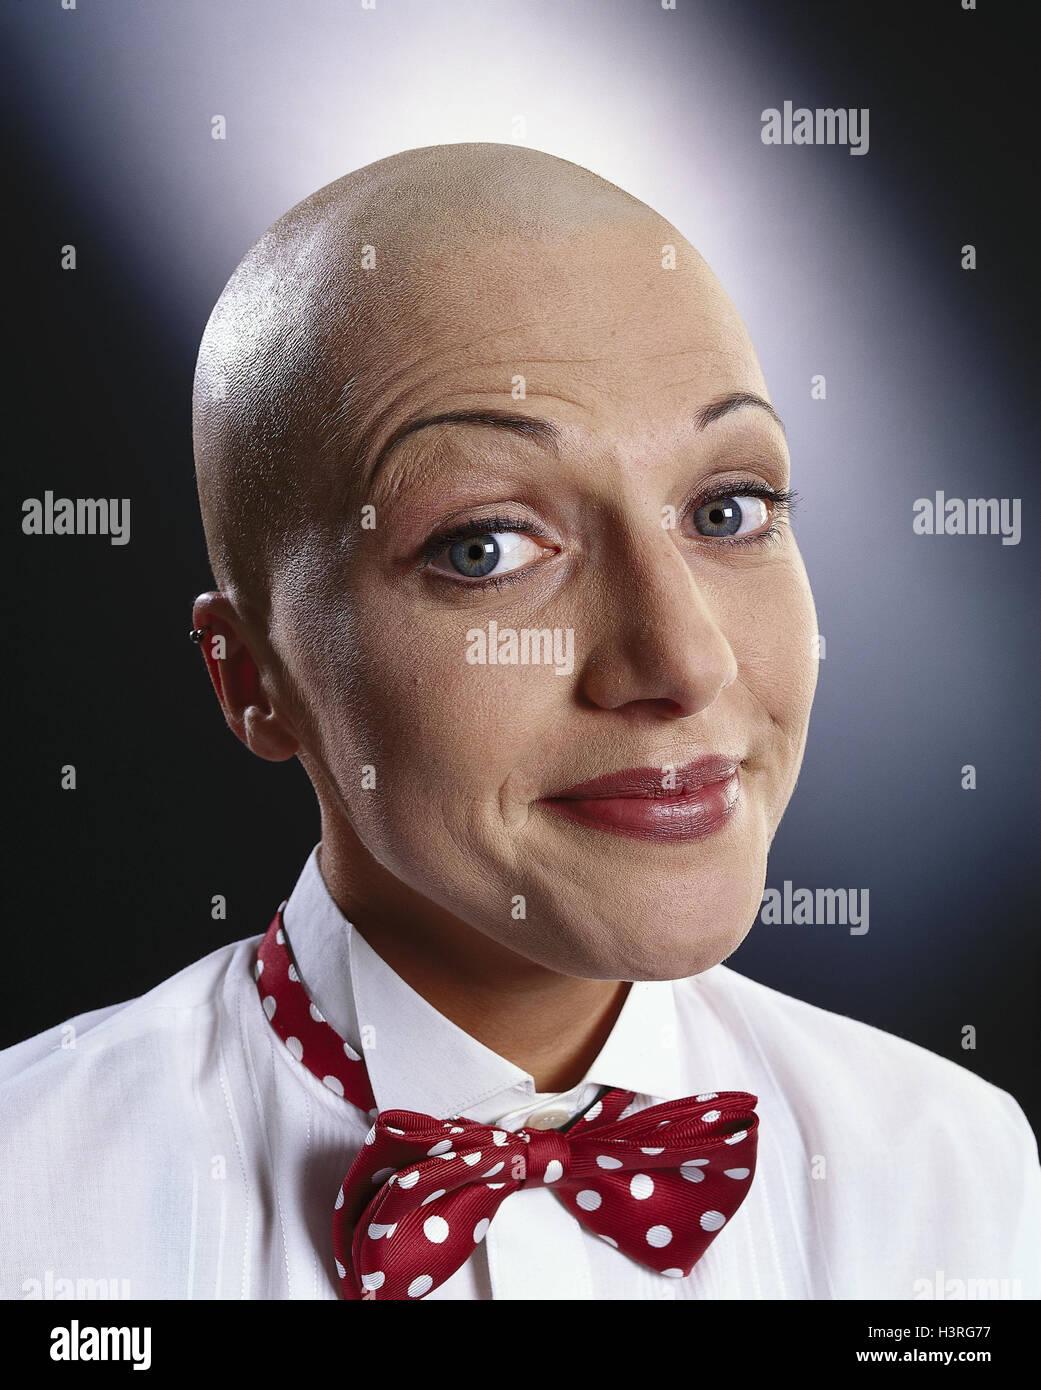 Frau Glatze Fliege Mimik Porträt Mb 251 A2 Stockfoto Bild